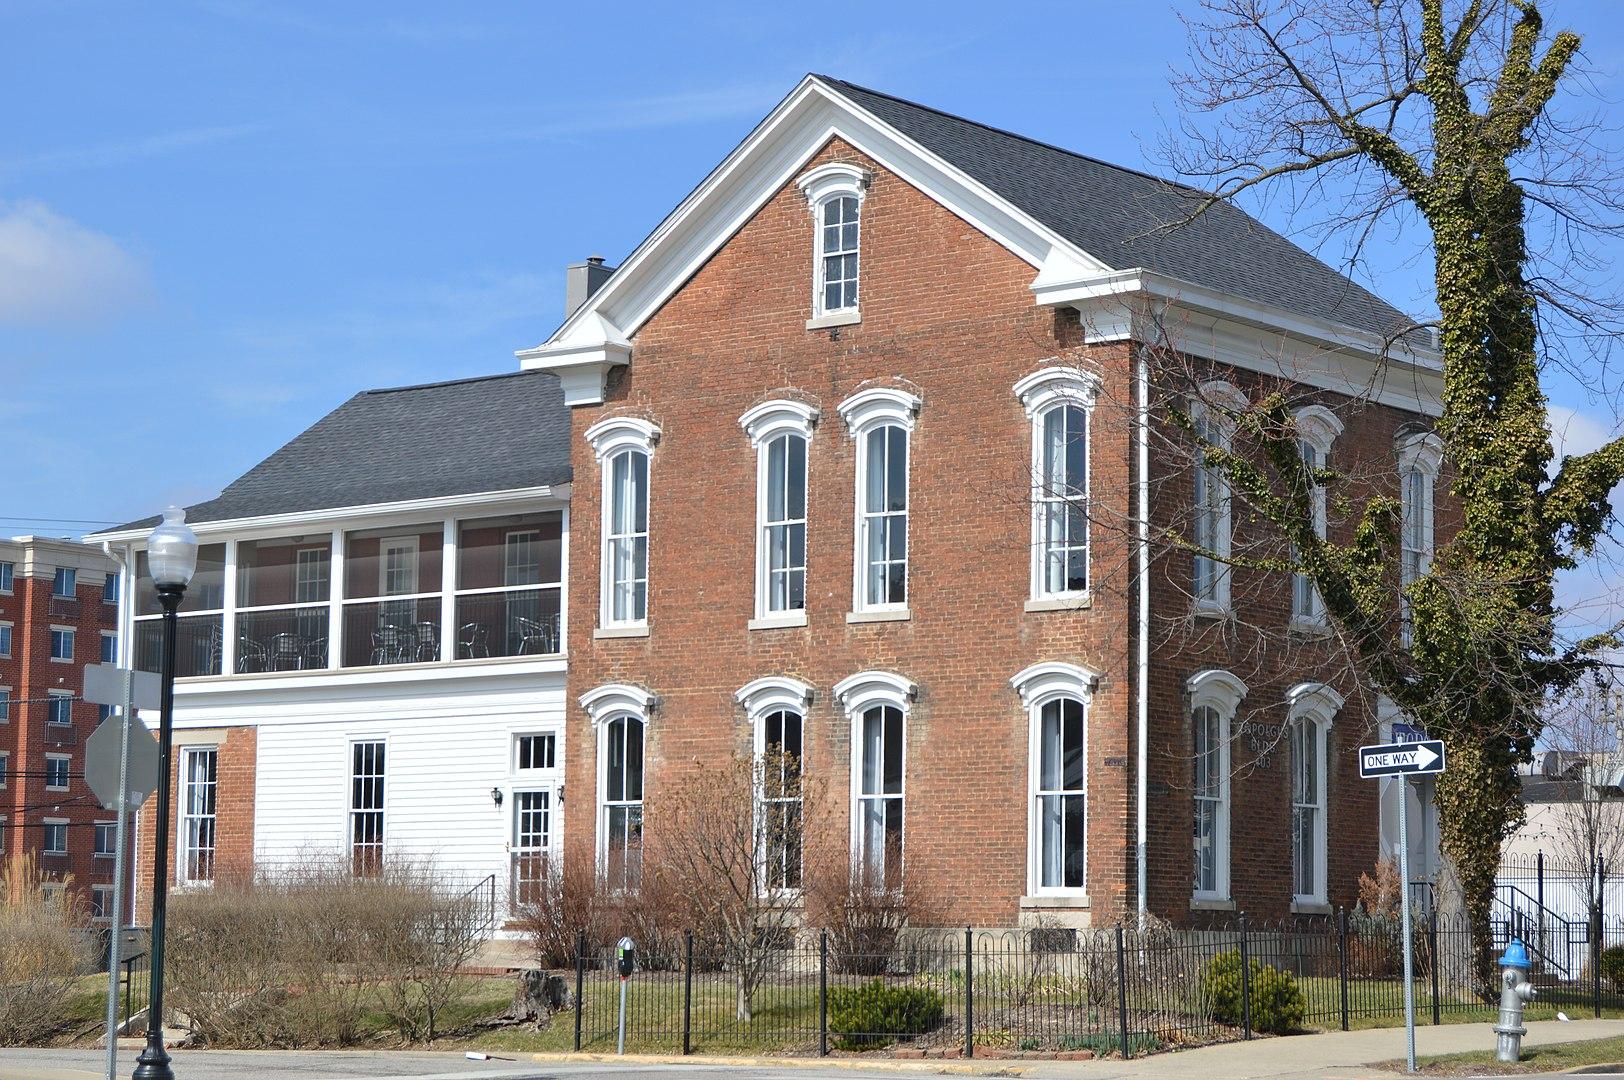 Millen-Chase-McCalla House (AKA The Topolgus Building)